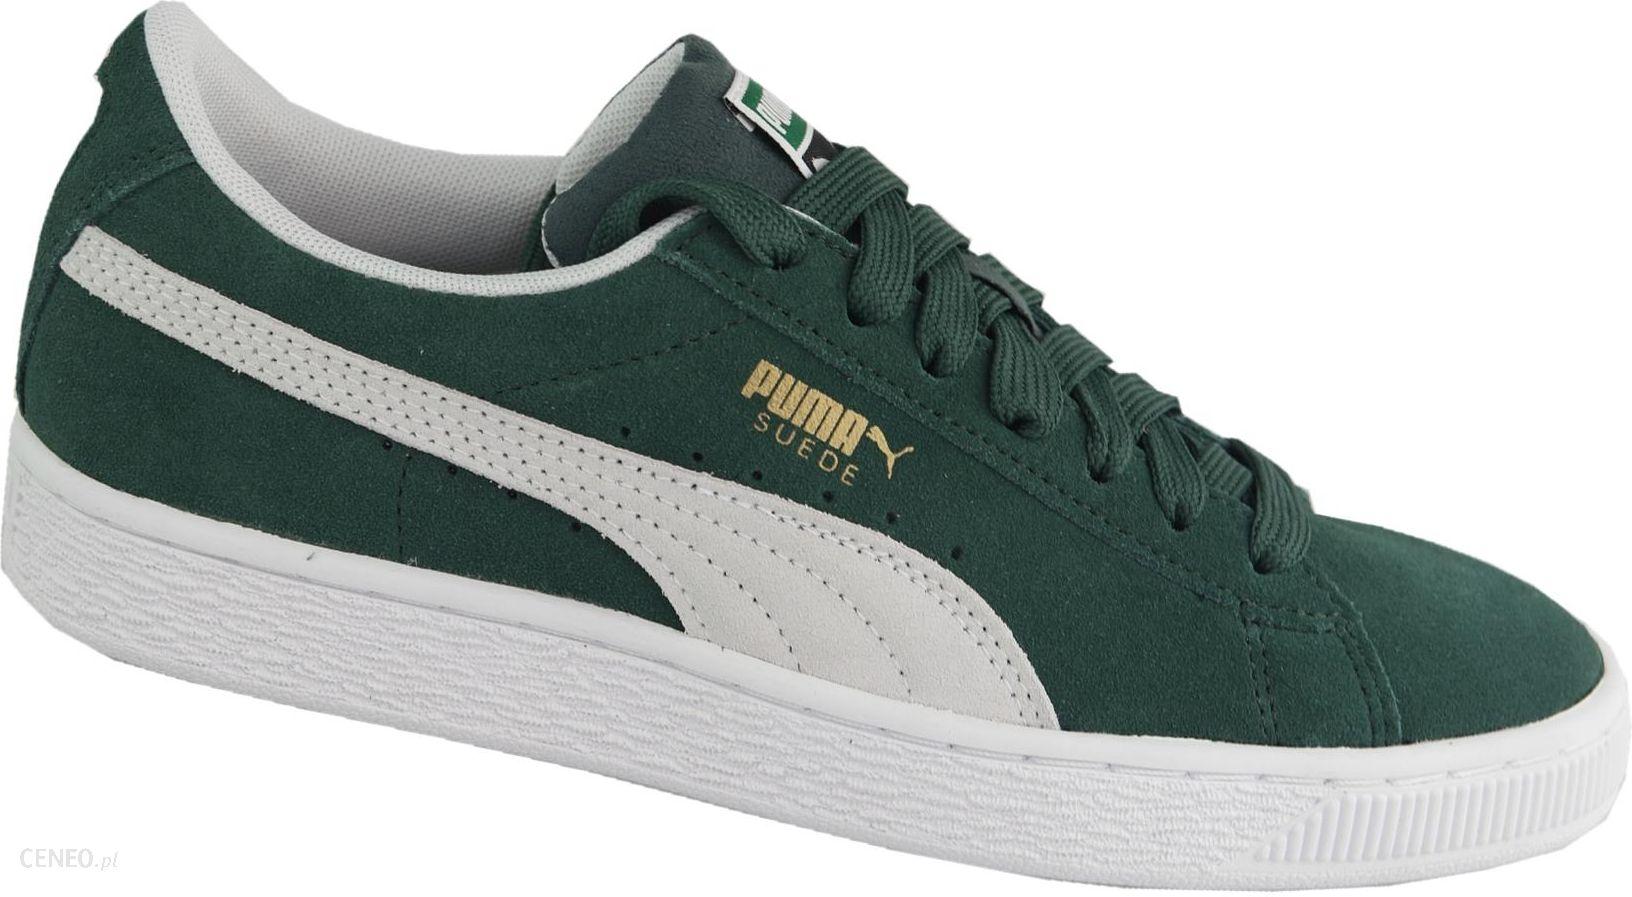 Puma Suede Classic Jr Pineneed 365073 06 R 38,5 Ceny i opinie Ceneo.pl